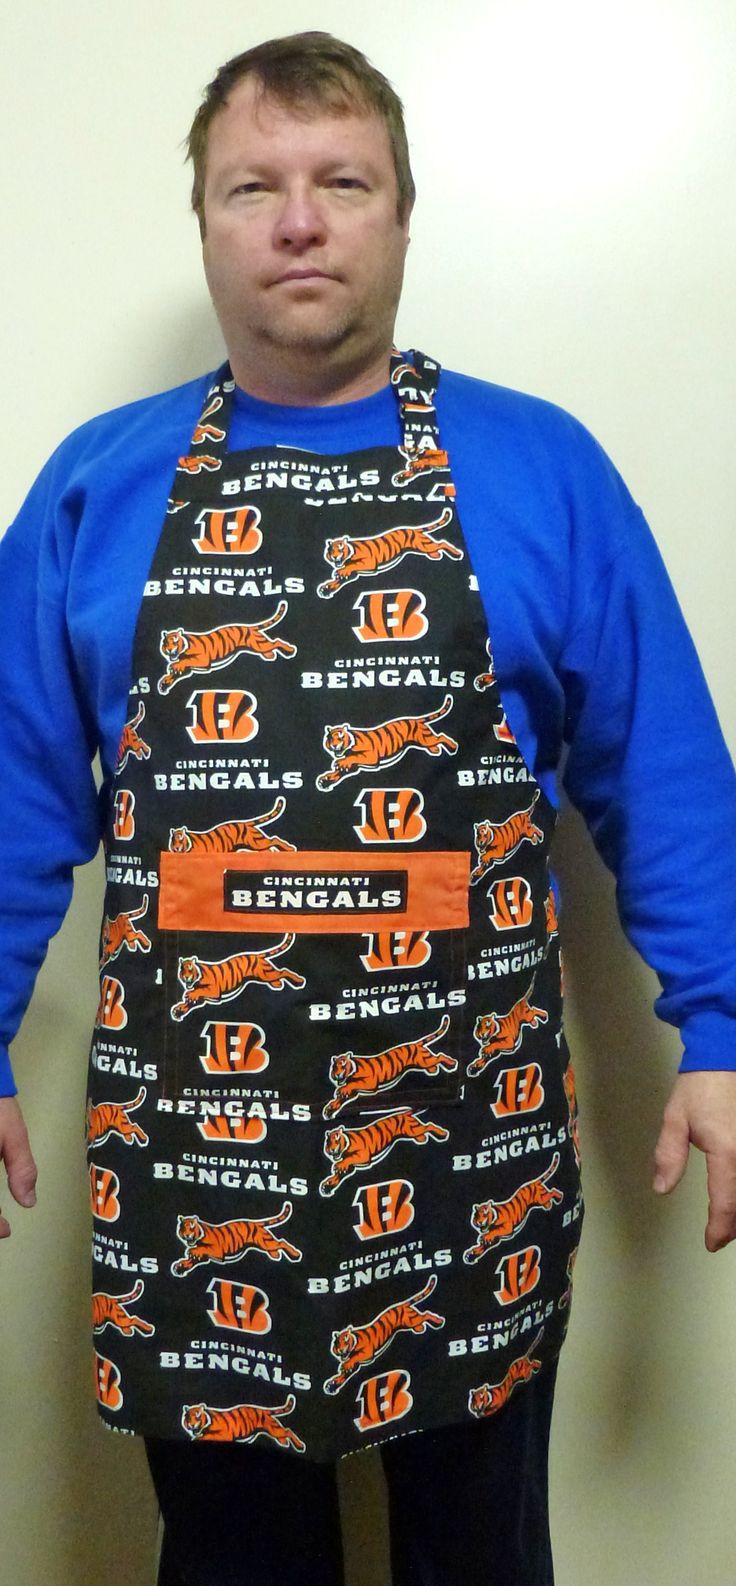 Cincinnati Bengals Apron, Unisex Style Football Team Apron, Mens Aprons, Womens Aprons, Sports Team Apron, Gifts for Men